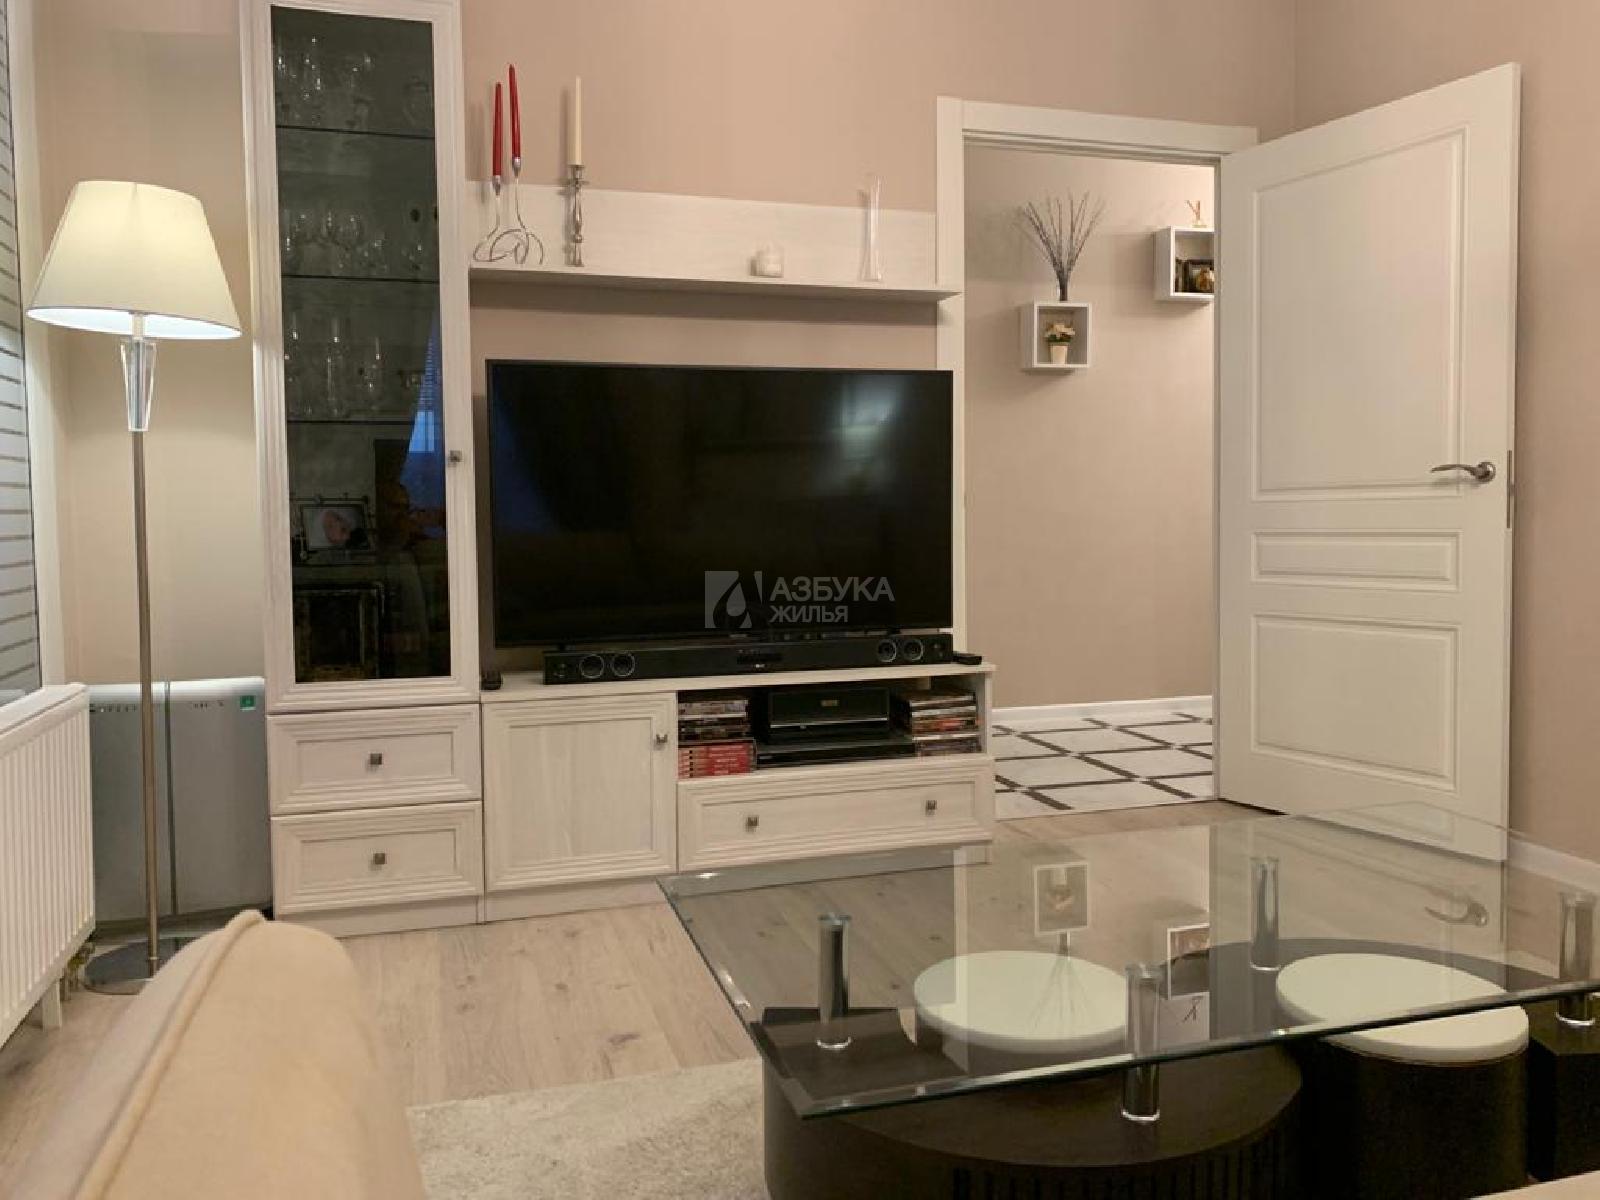 Фото №13 - 3-комнатная квартира, Москва, Поляны улица 5, метро Улица Скобелевская